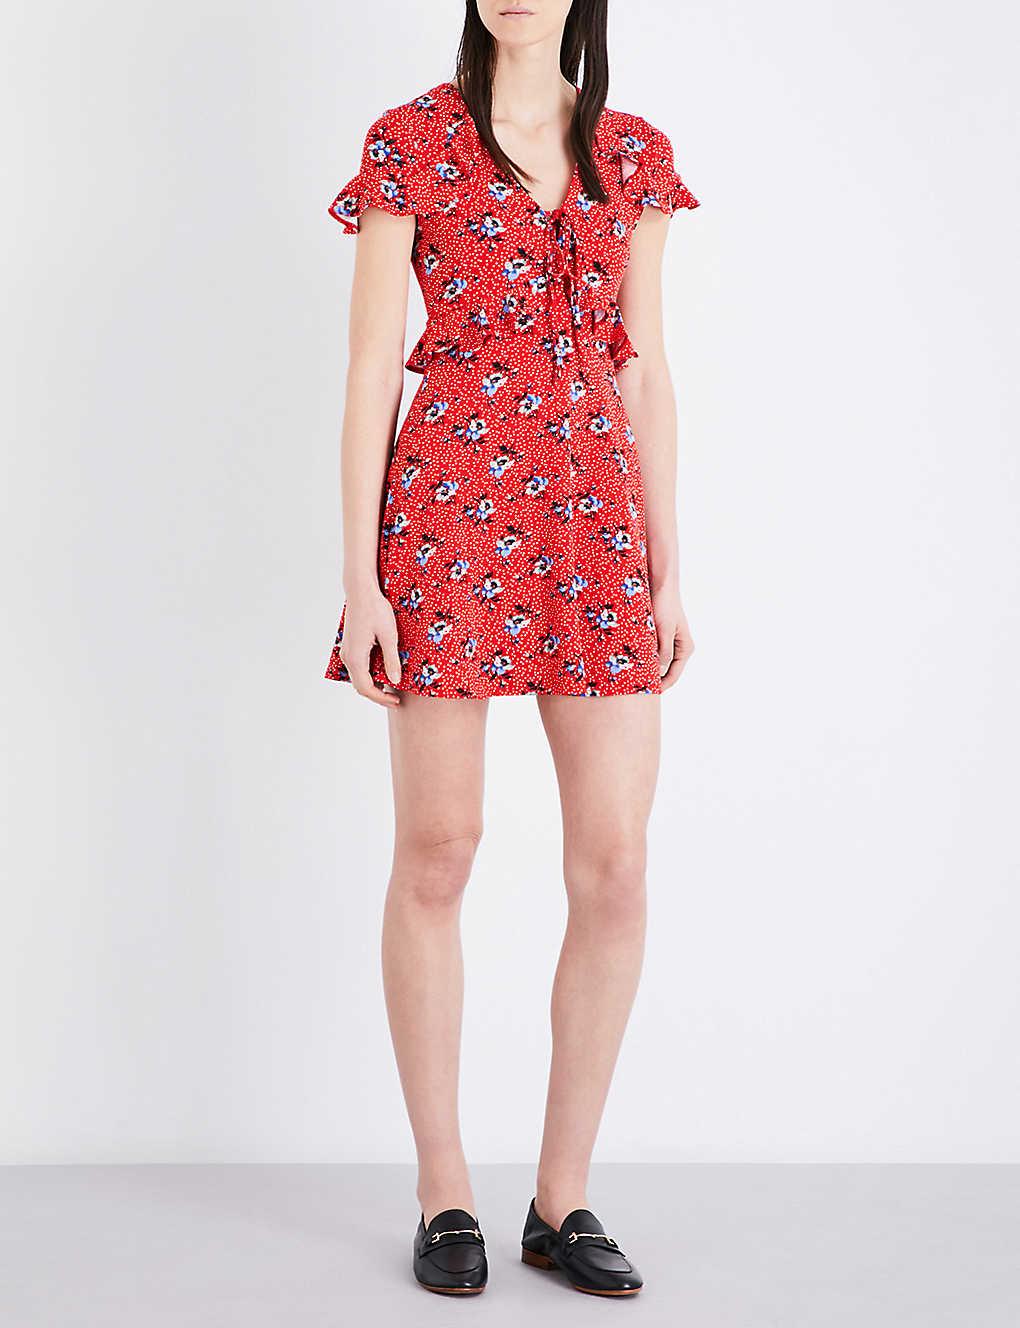 52a4aeac83430 TOPSHOP - Red Spot Floral stretch-crepe tea dress | Selfridges.com